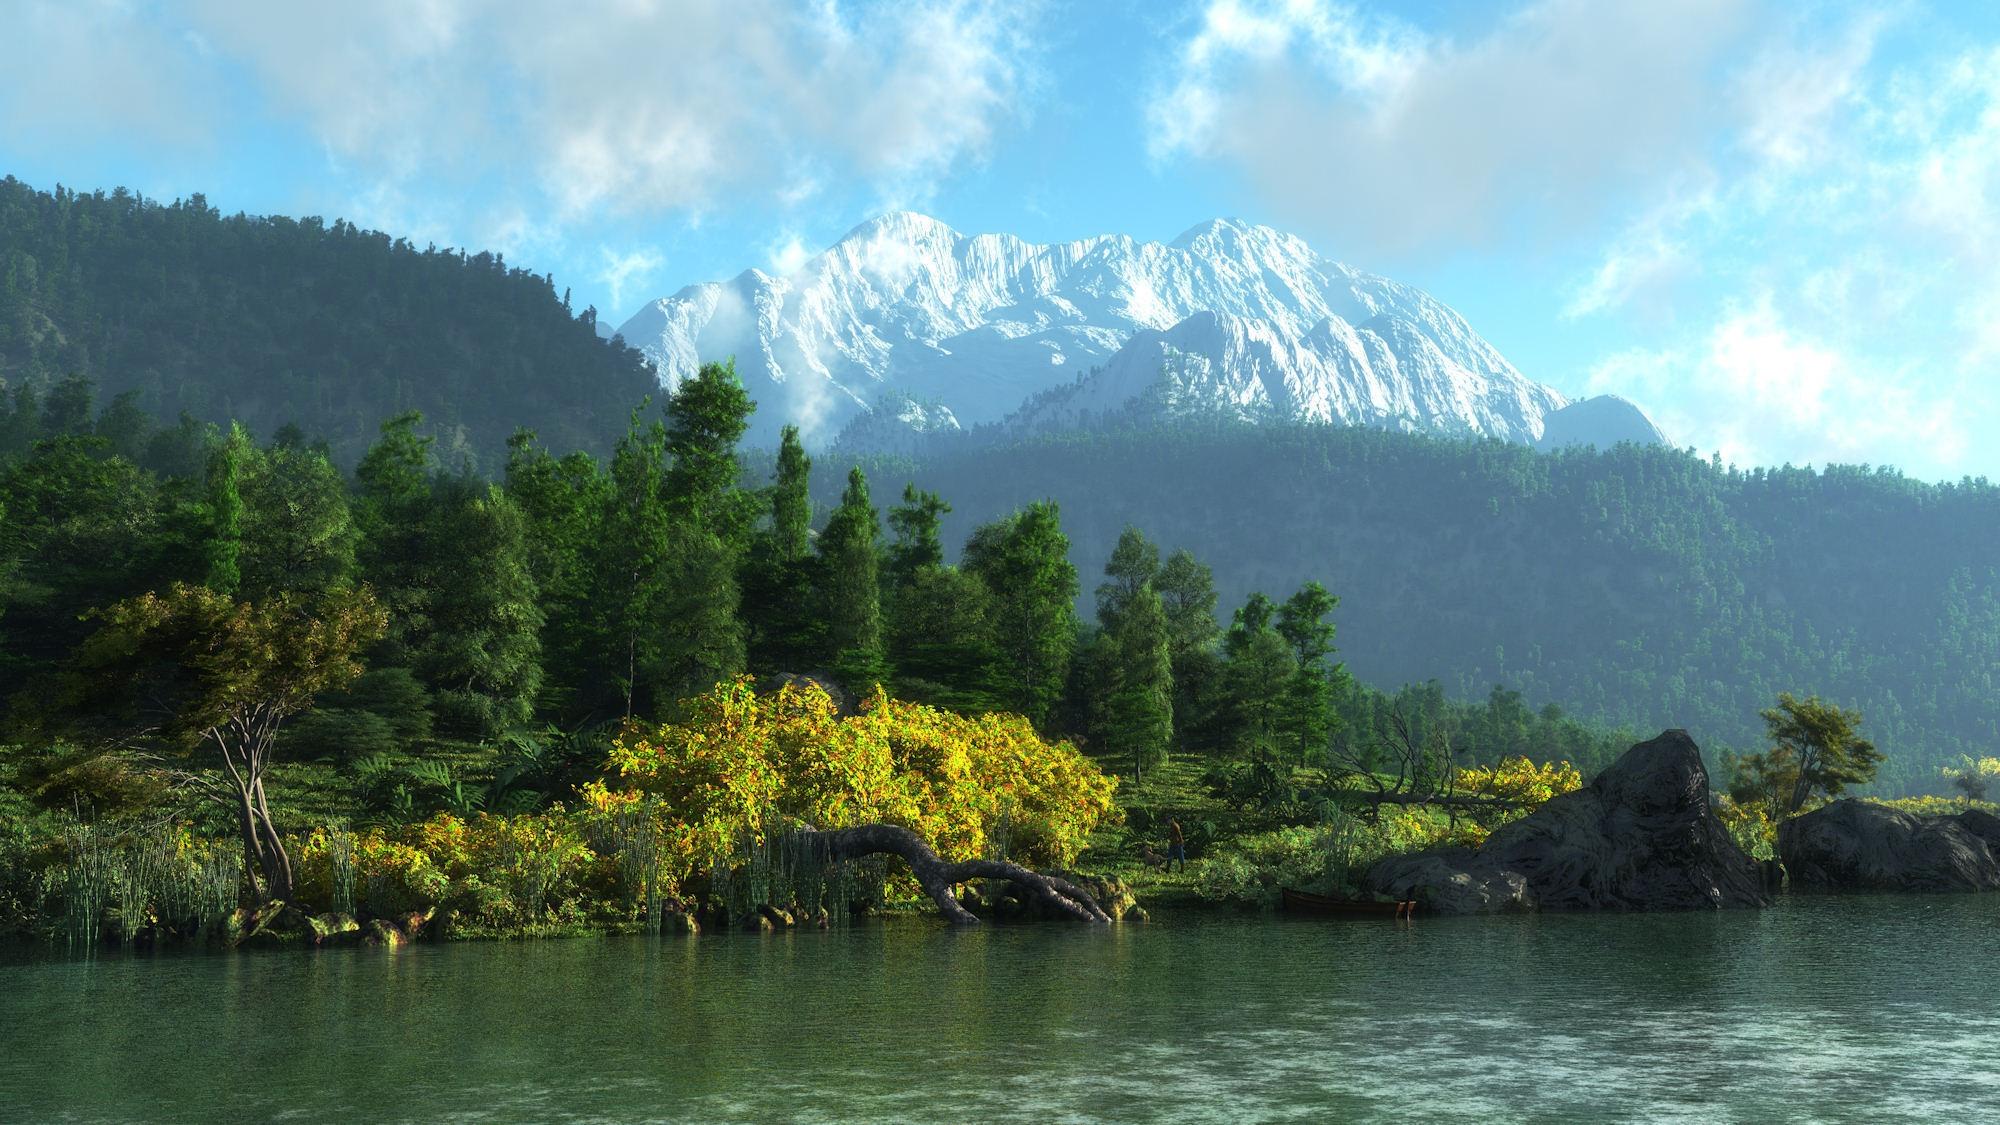 Лес горы и река картинки и обои (3)